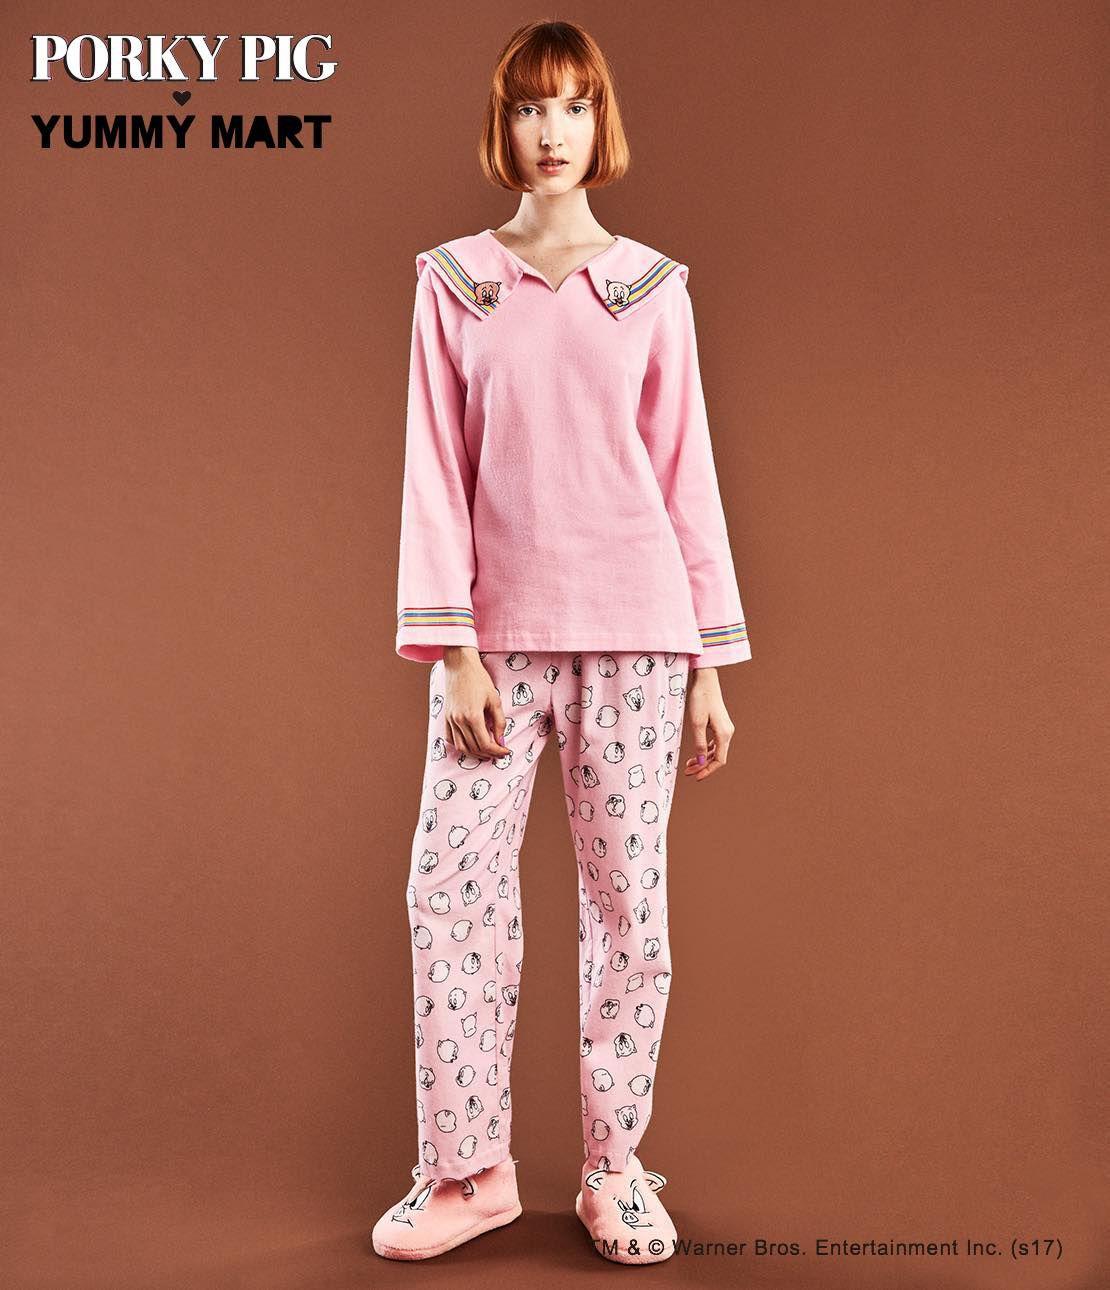 YM Porky Pig flannel pajamas